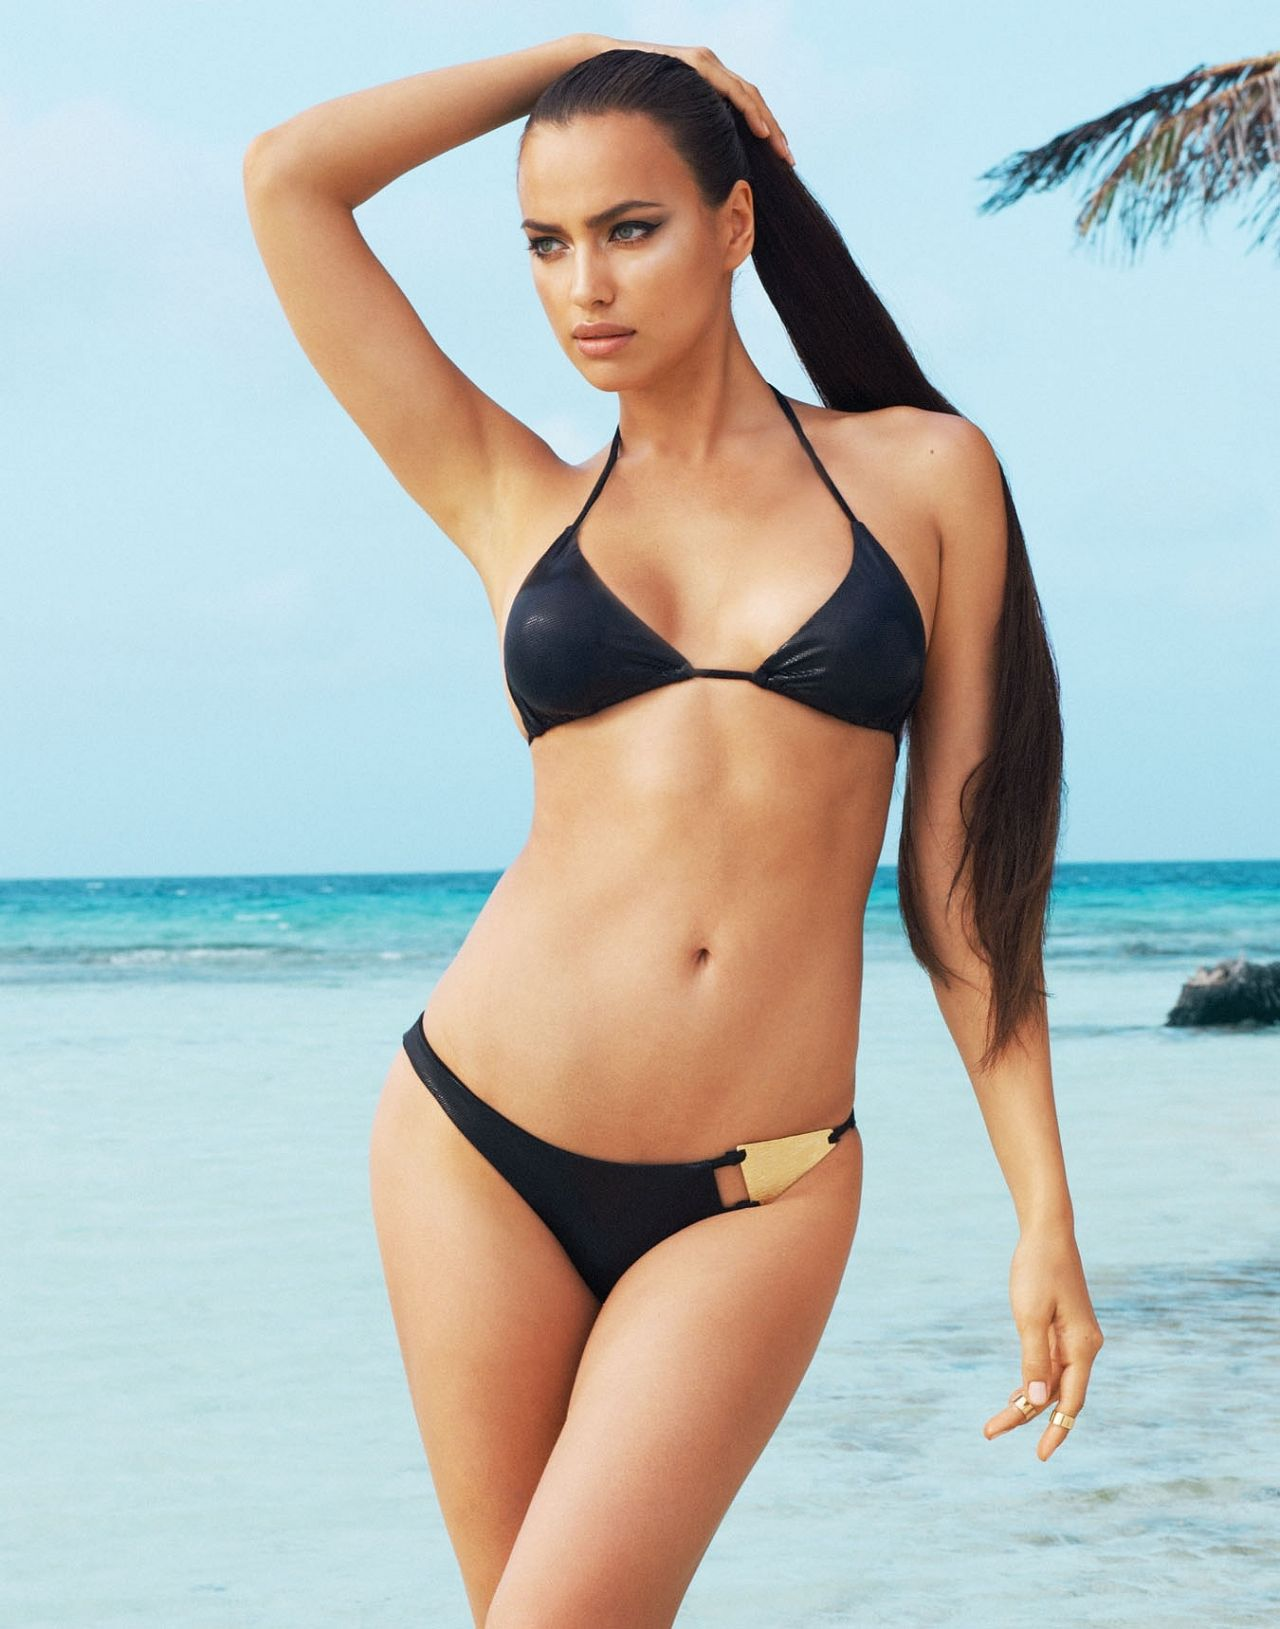 Irina Shayk Bikini Photoshoot Beach Bunny Part Ii